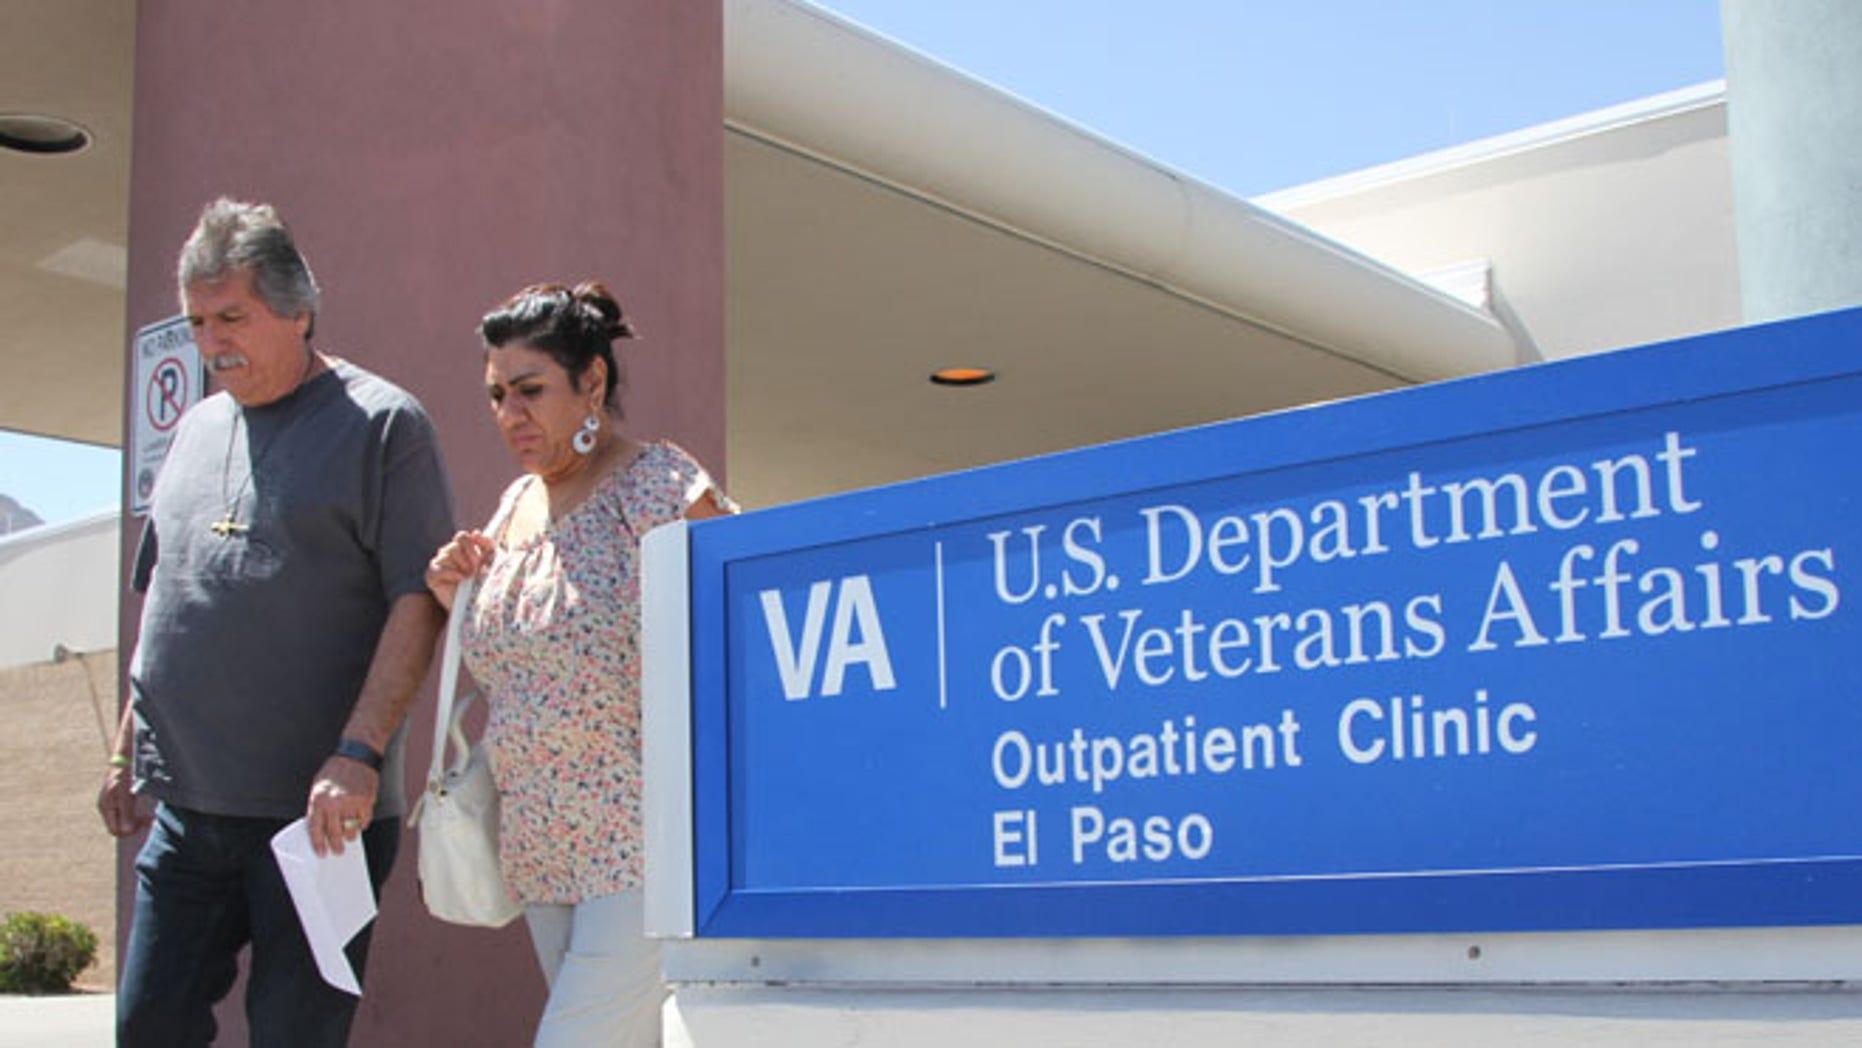 June 9, 2014: David and Marianne Trujillo exit the Vetaran Affairs facility in El Paso, Texas.